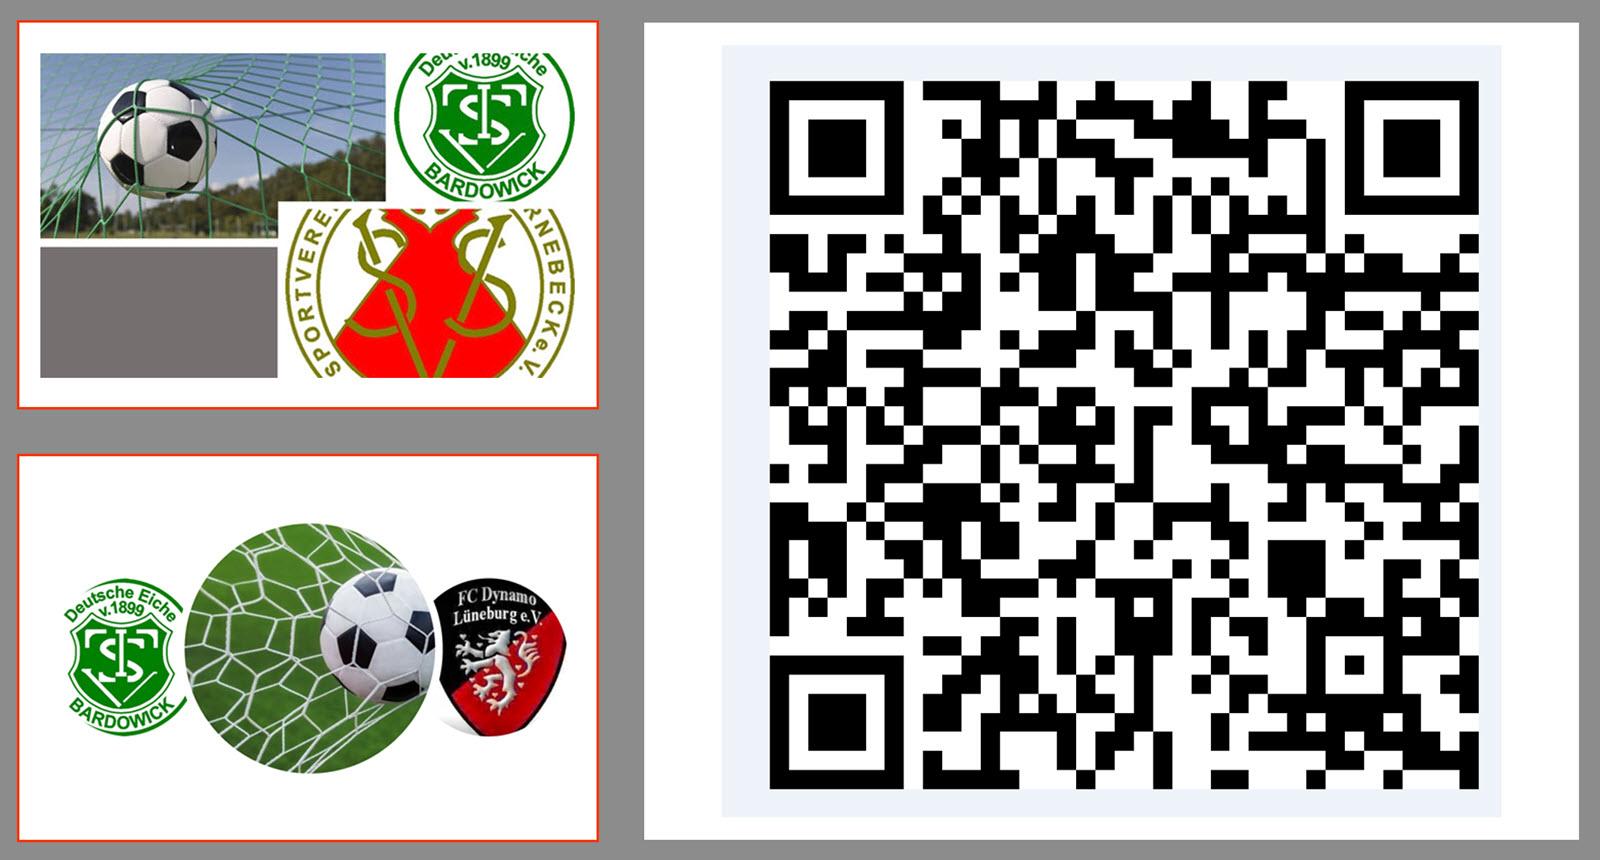 TSV Bardowick - SV Scharnebeck und TSV Bardowick II - Dynamo Lüneburg